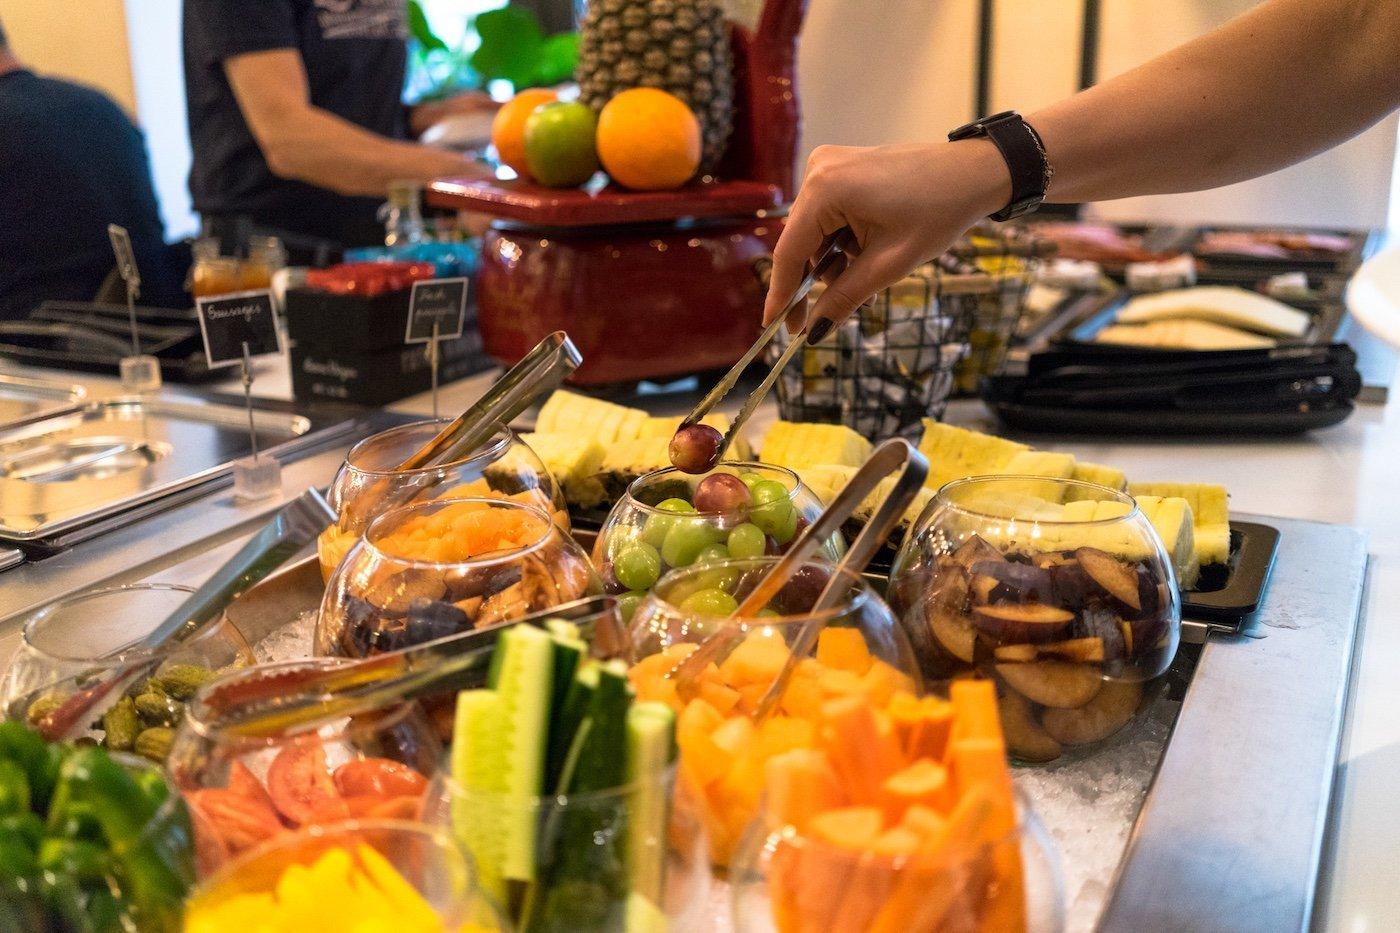 Hotel Moments Budapest 4 Sterne Andrassy Avenue Utca Einkaufsstraße Hauptstadt Ungarn Frühstücksbuffet Ananas Melonen